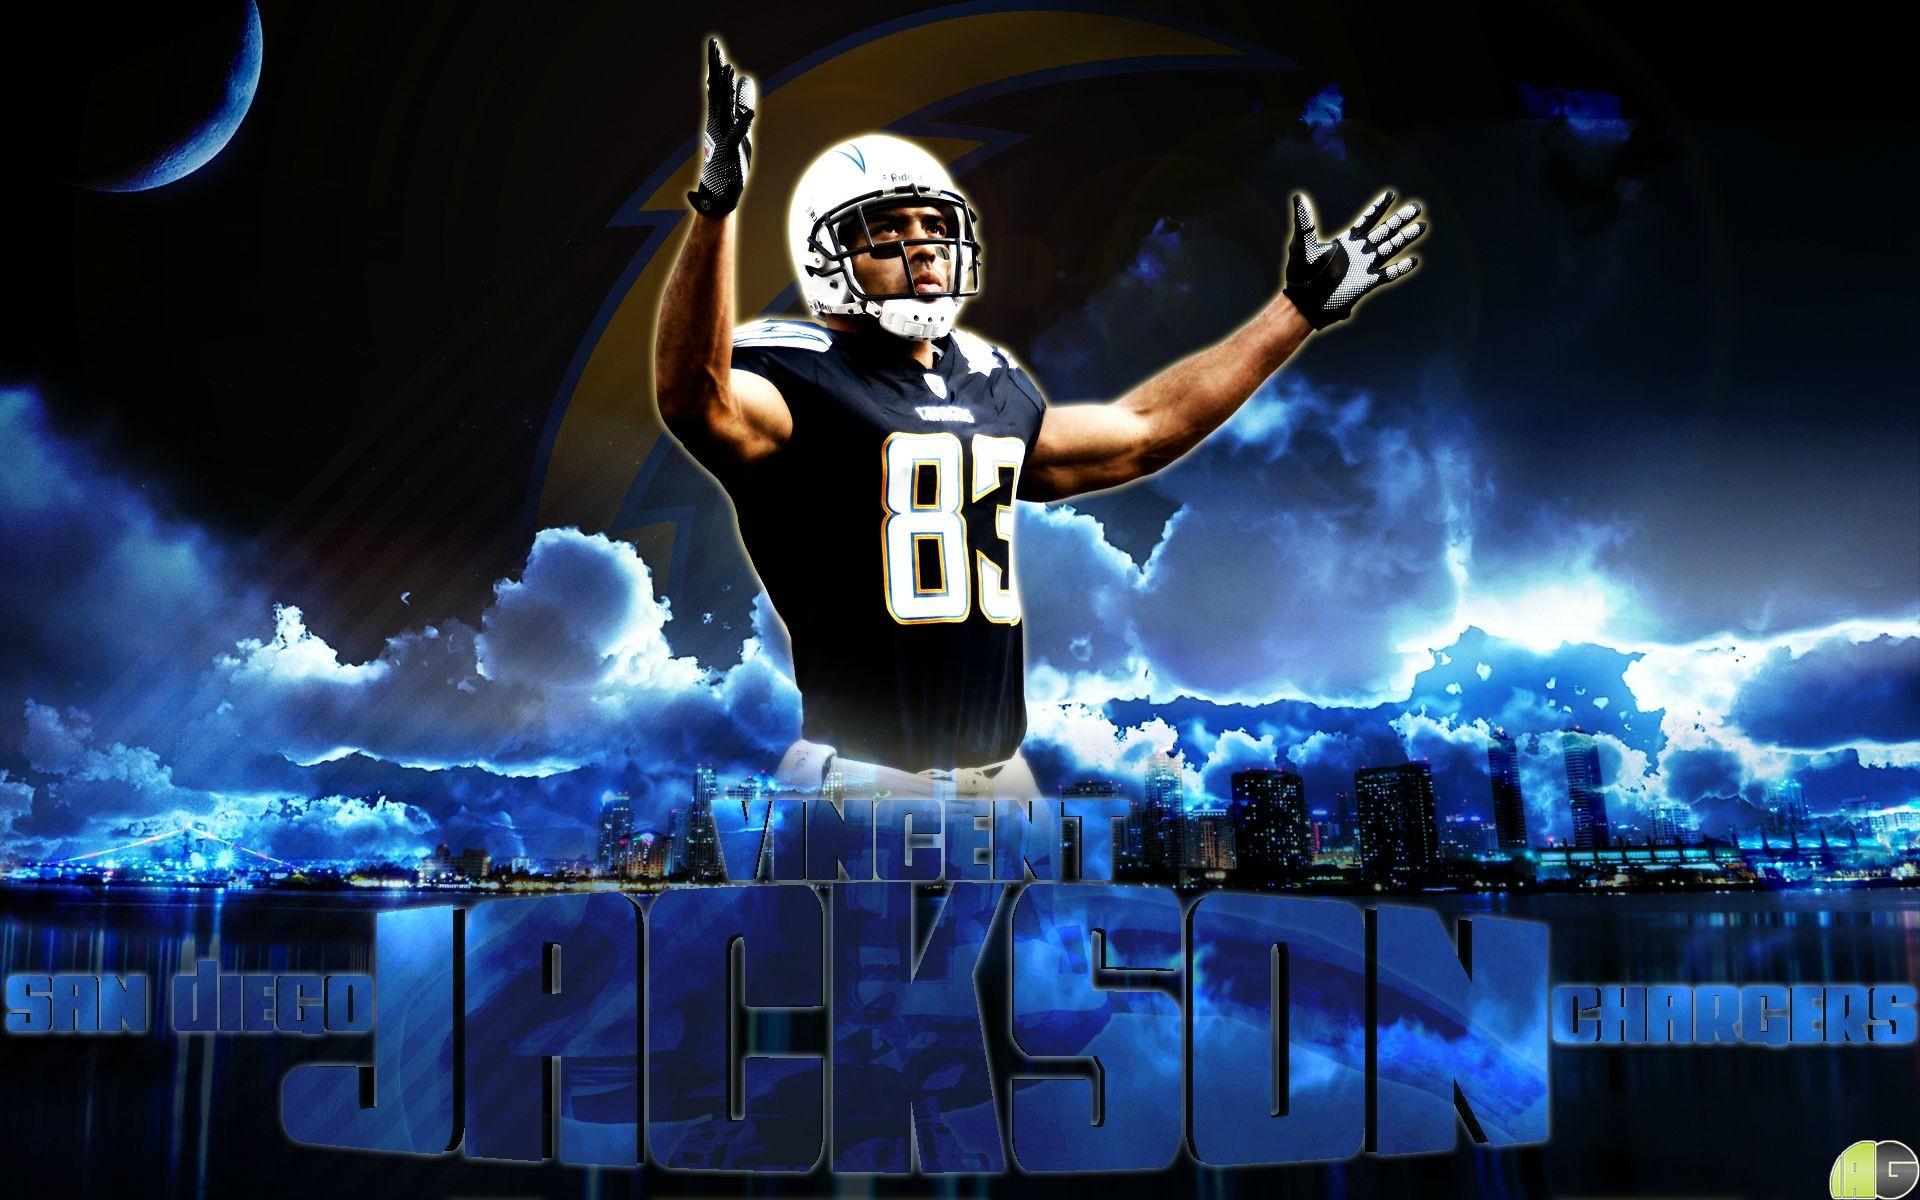 #VincentJackson #Football #NFL #Wallpaper #Background https://www.